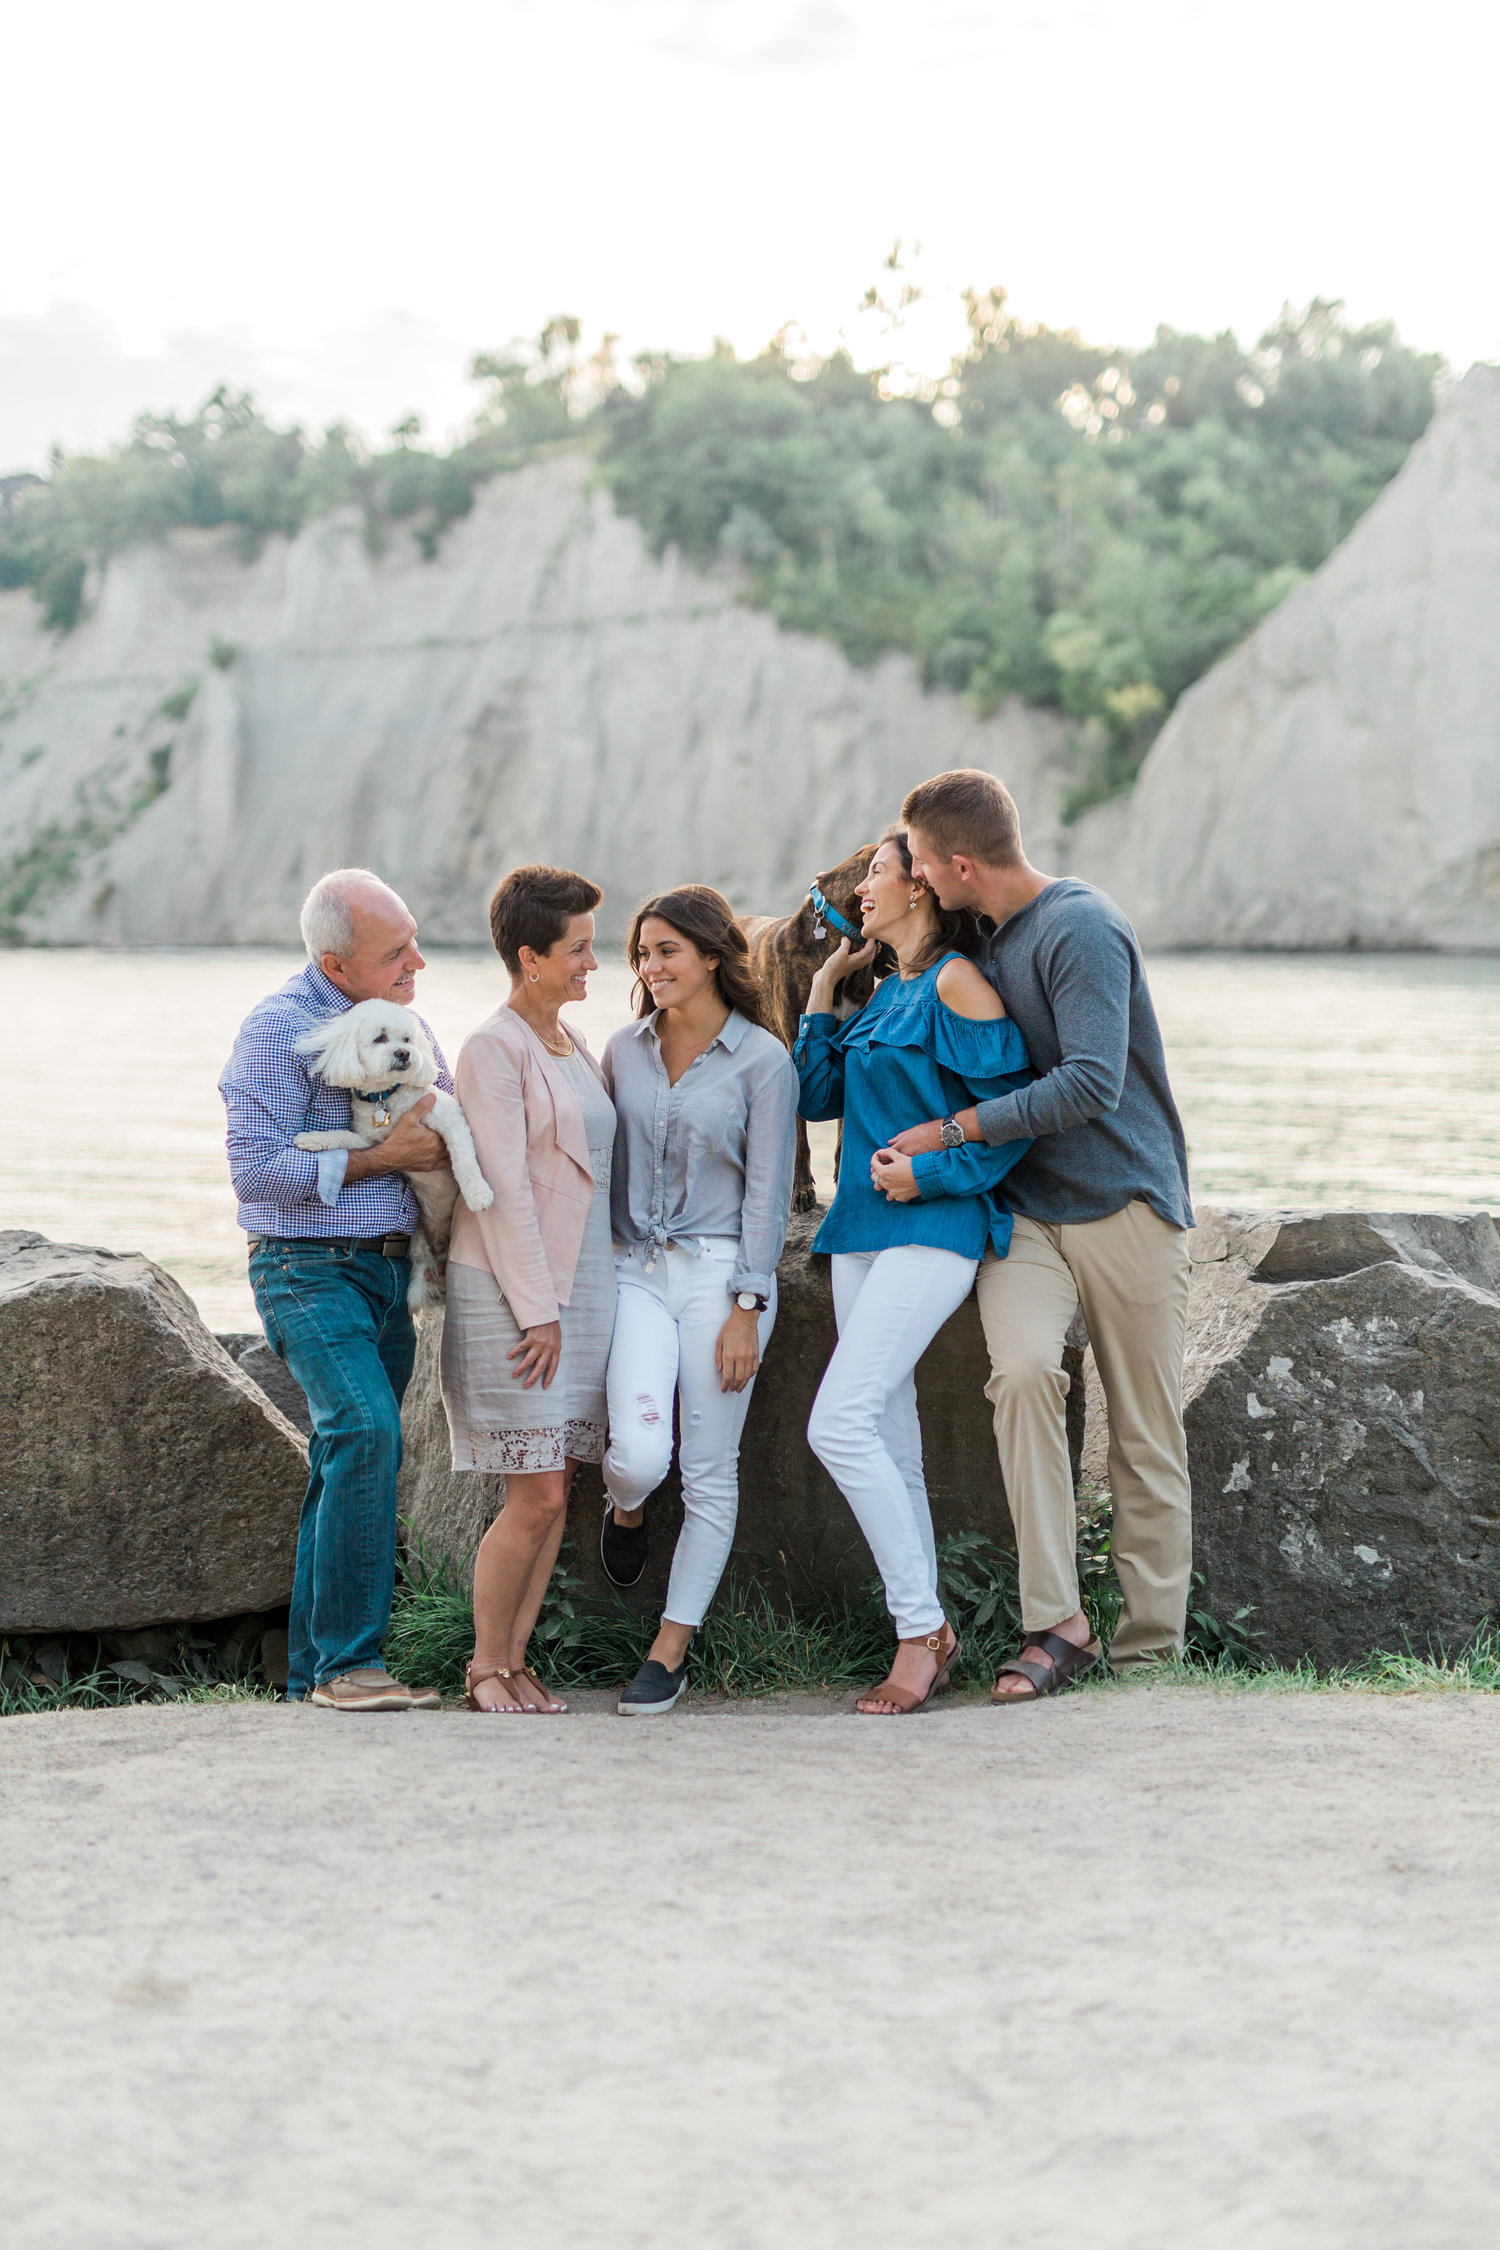 Danielle-Giroux-Amir-Golbazi-Genua-Family-Photography-Scarborough-Bluffs-9356.jpg